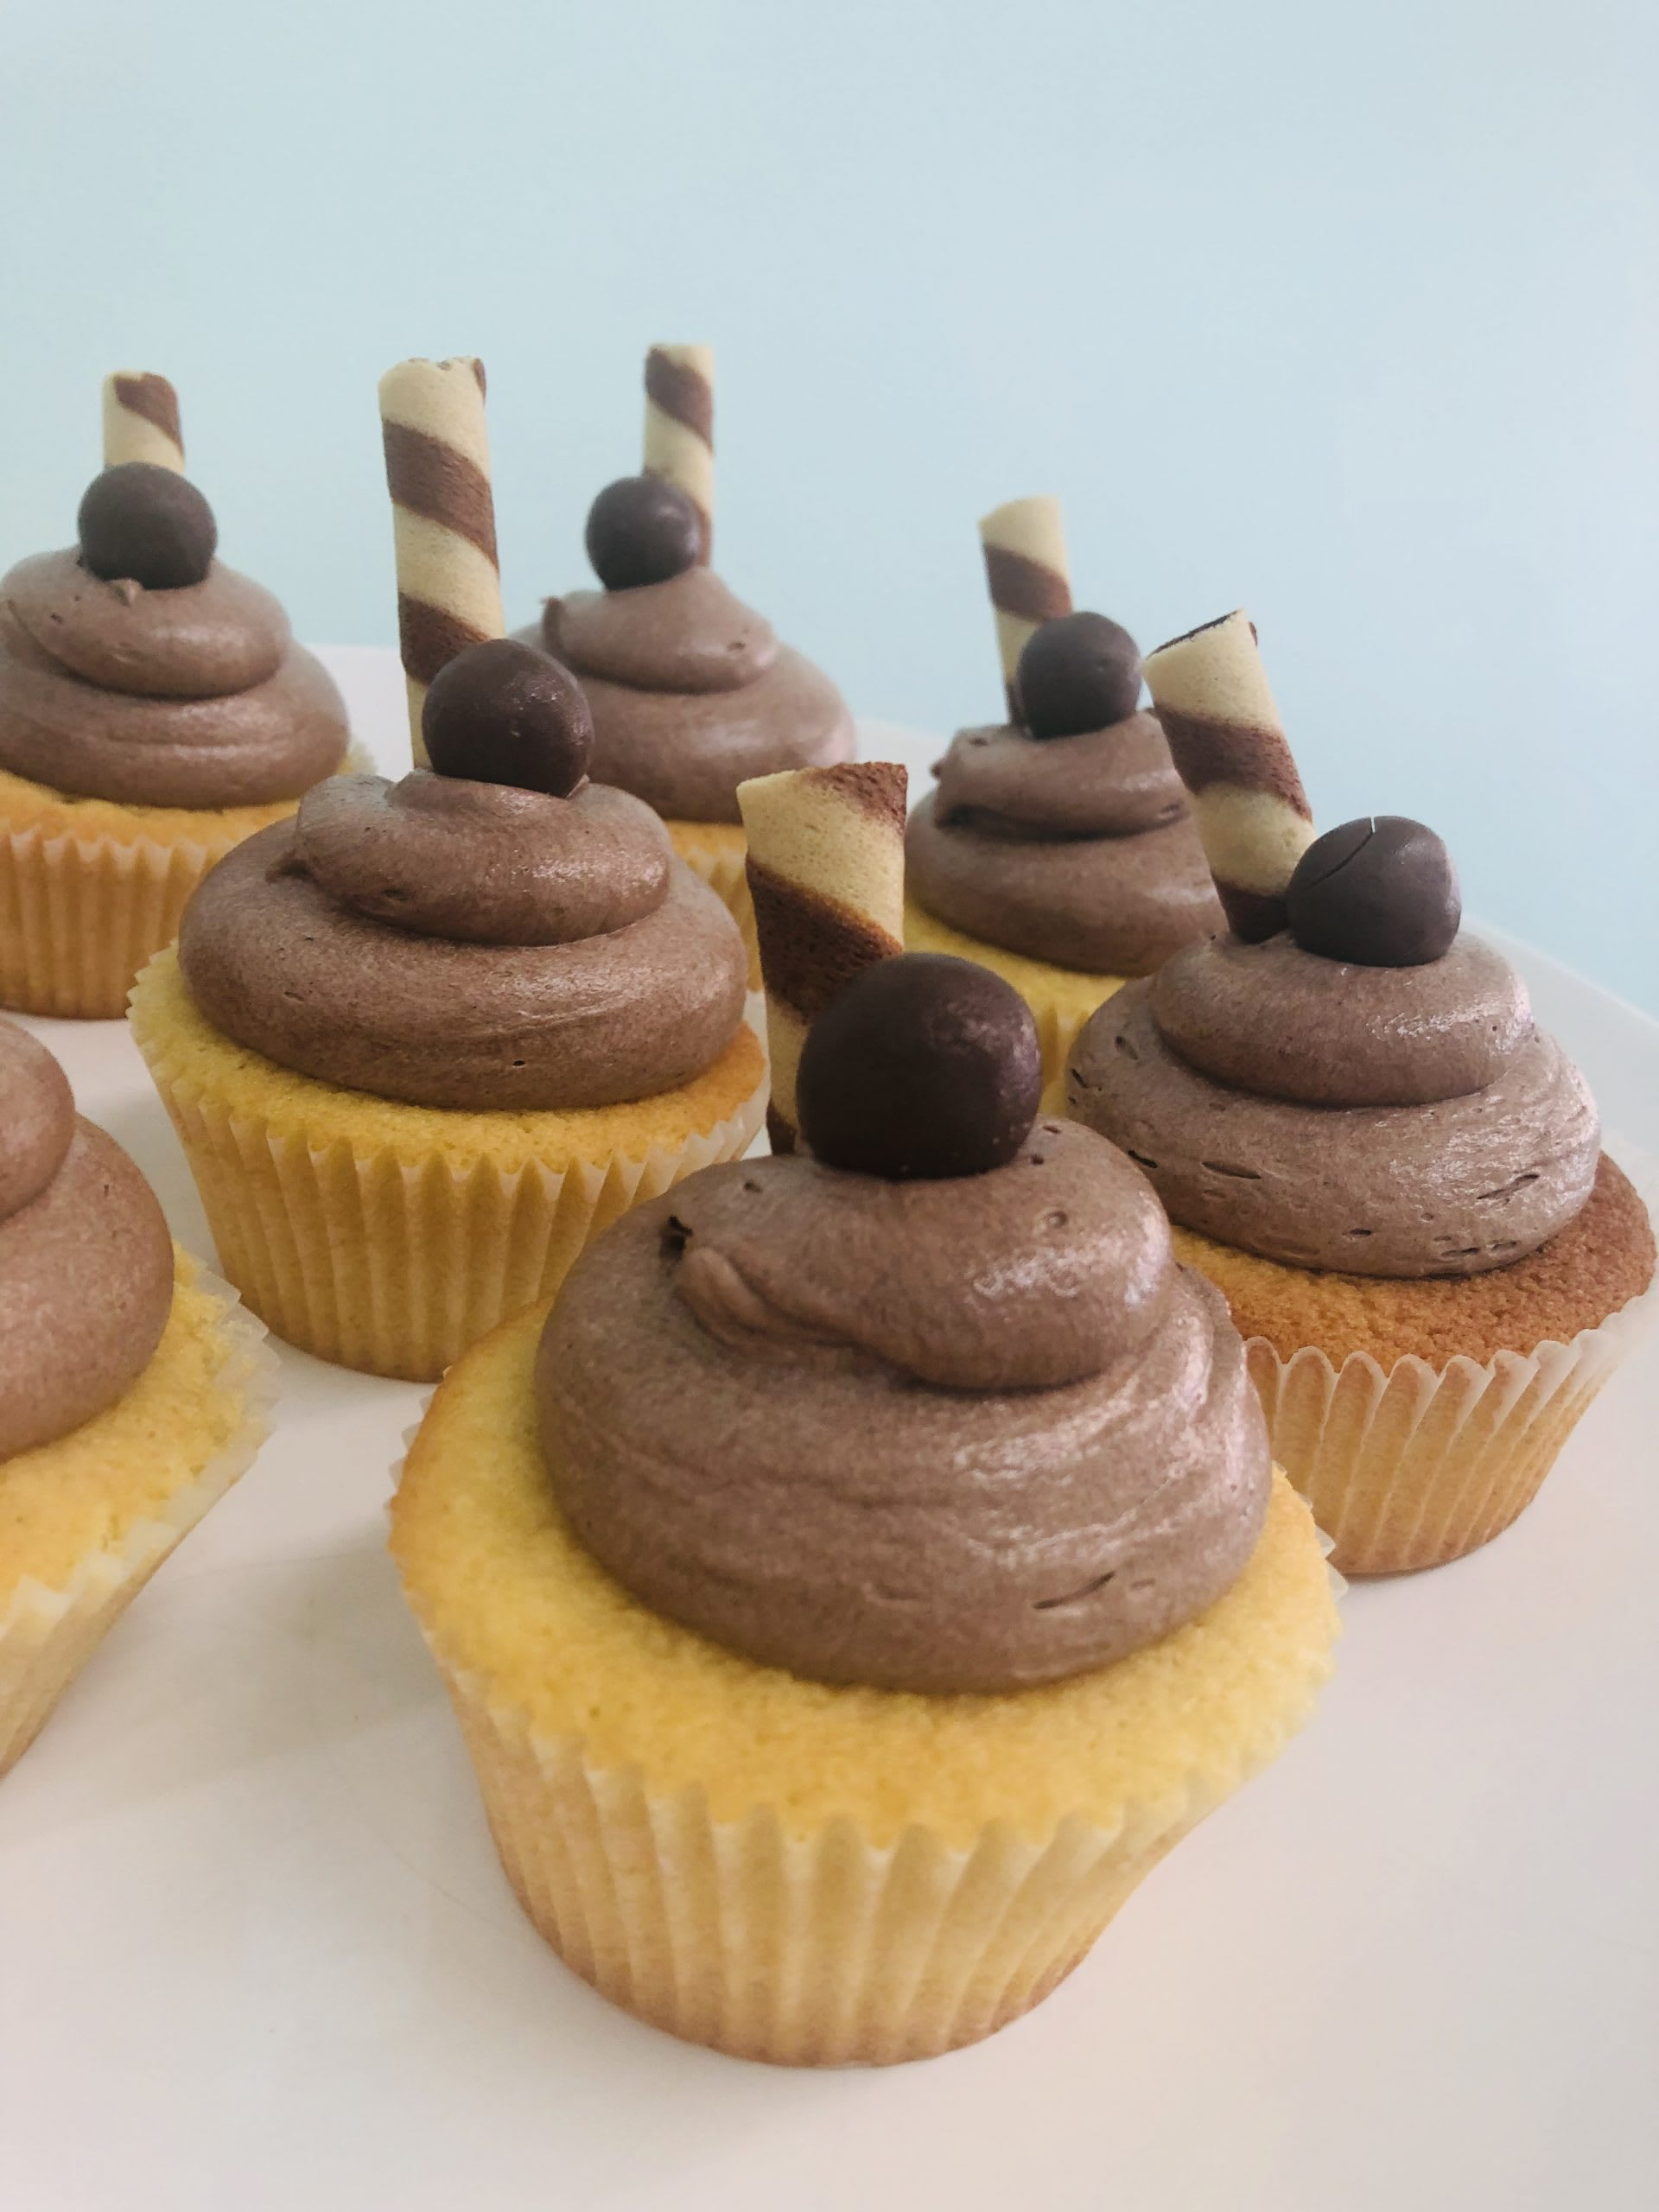 Heavenly Choc Cupcakes sydney